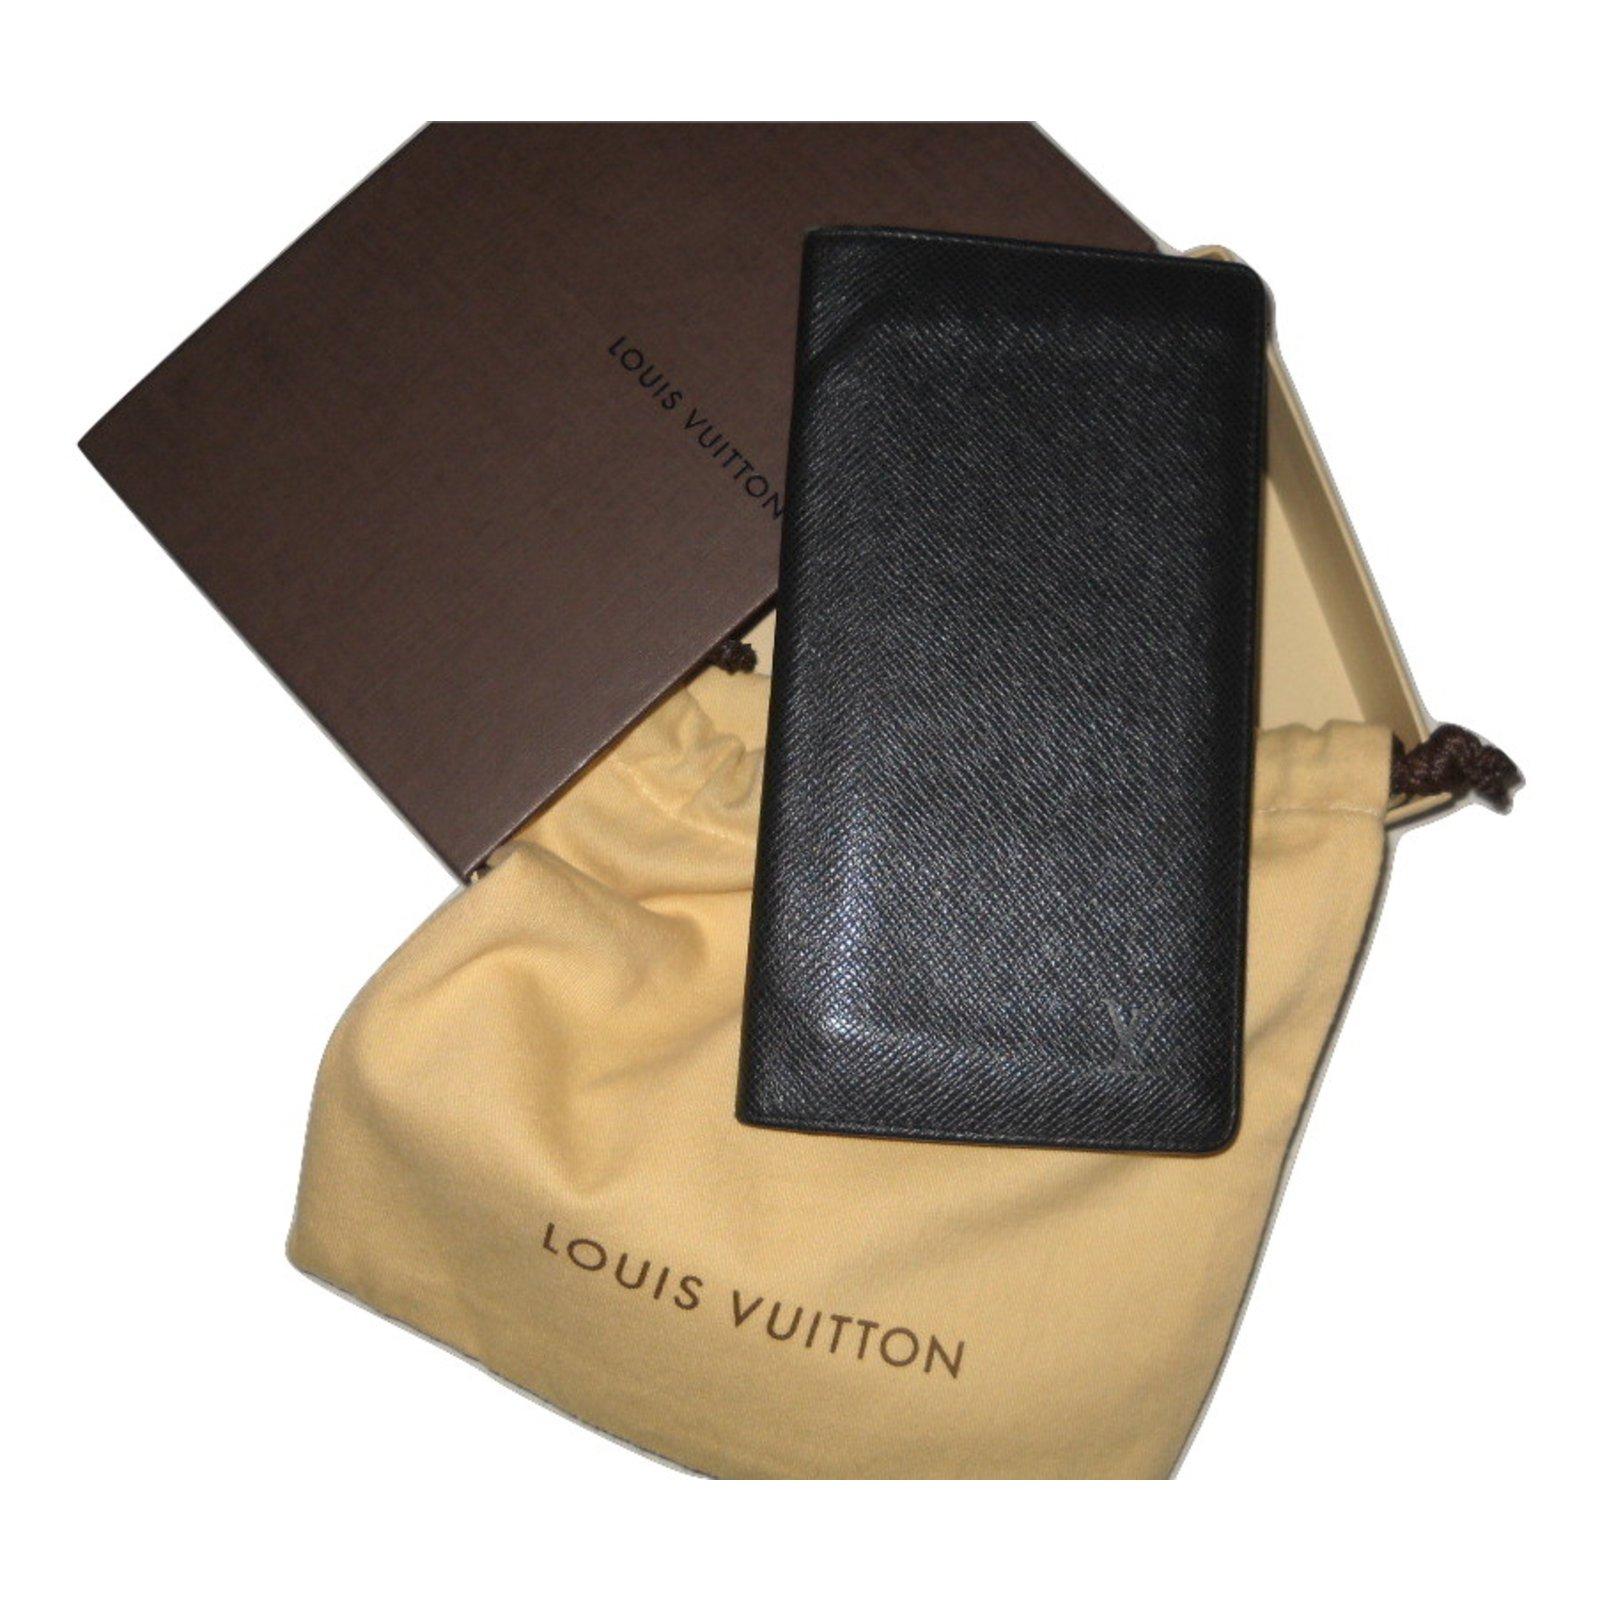 Petite maroquinerie homme Louis Vuitton Portefeuille cuir Taiga Cuir Gris  ref.27011 fdf8a3eb5c3